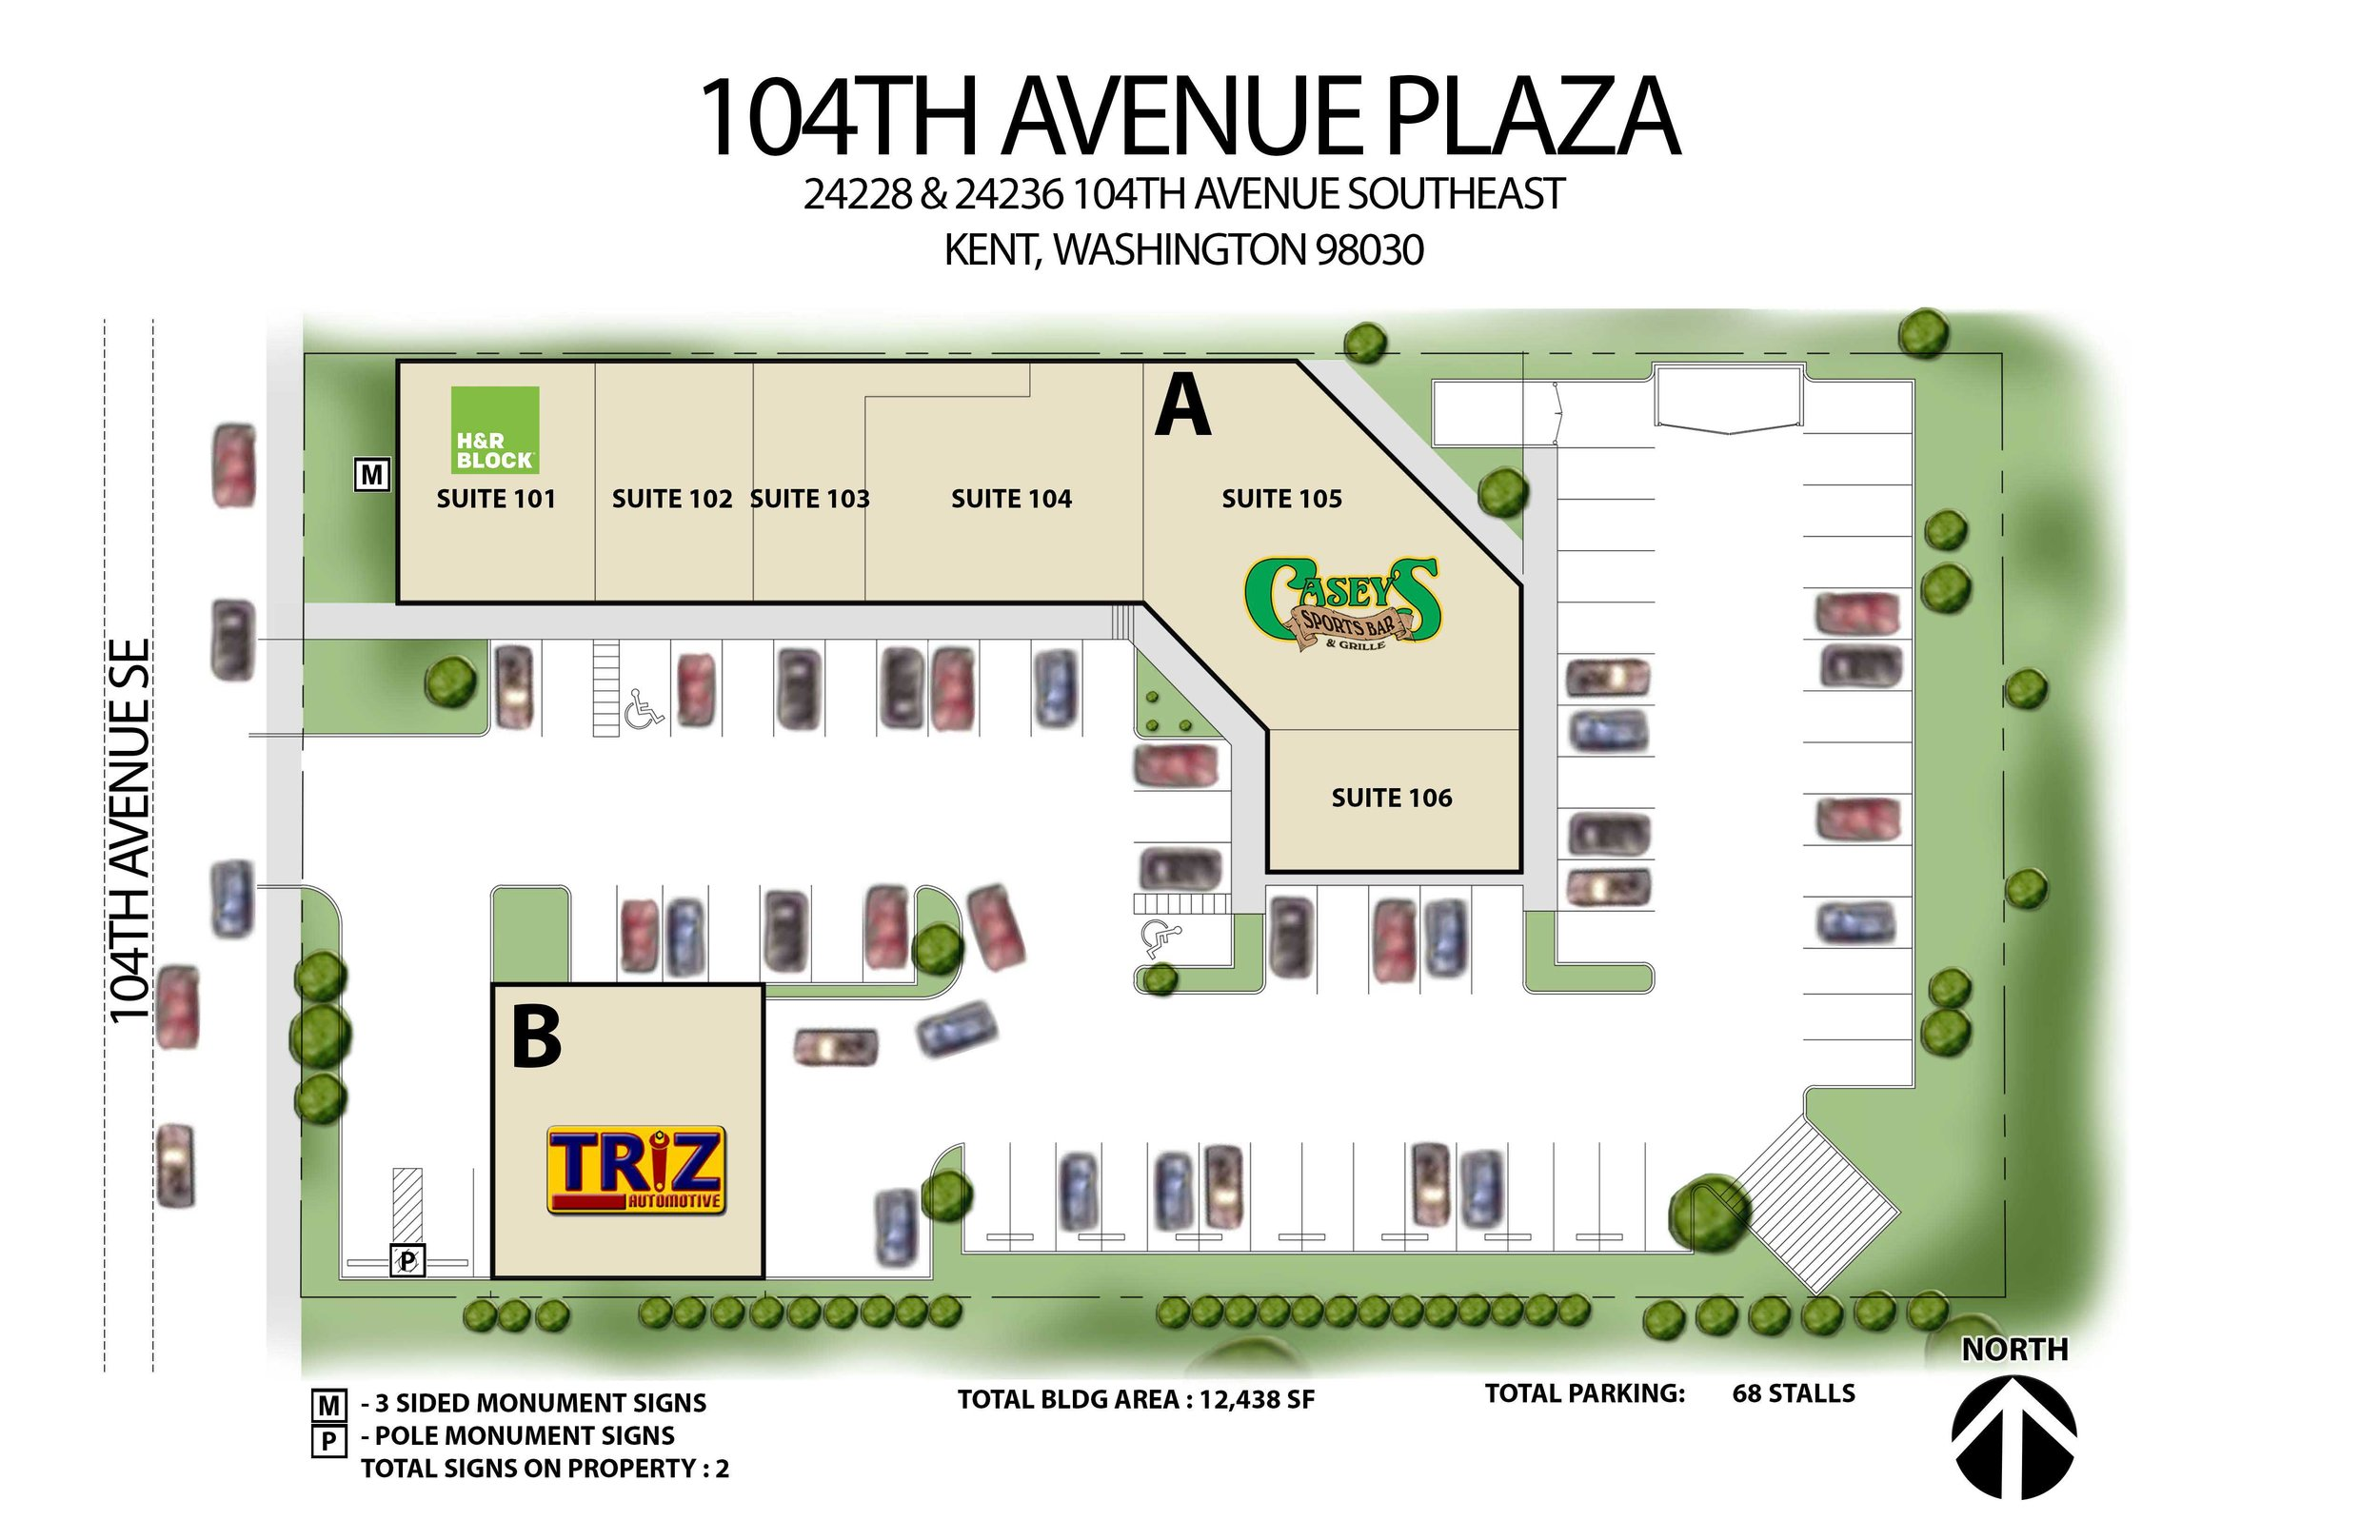 104TH-Avenue-Plaza-11-2-2017.jpg